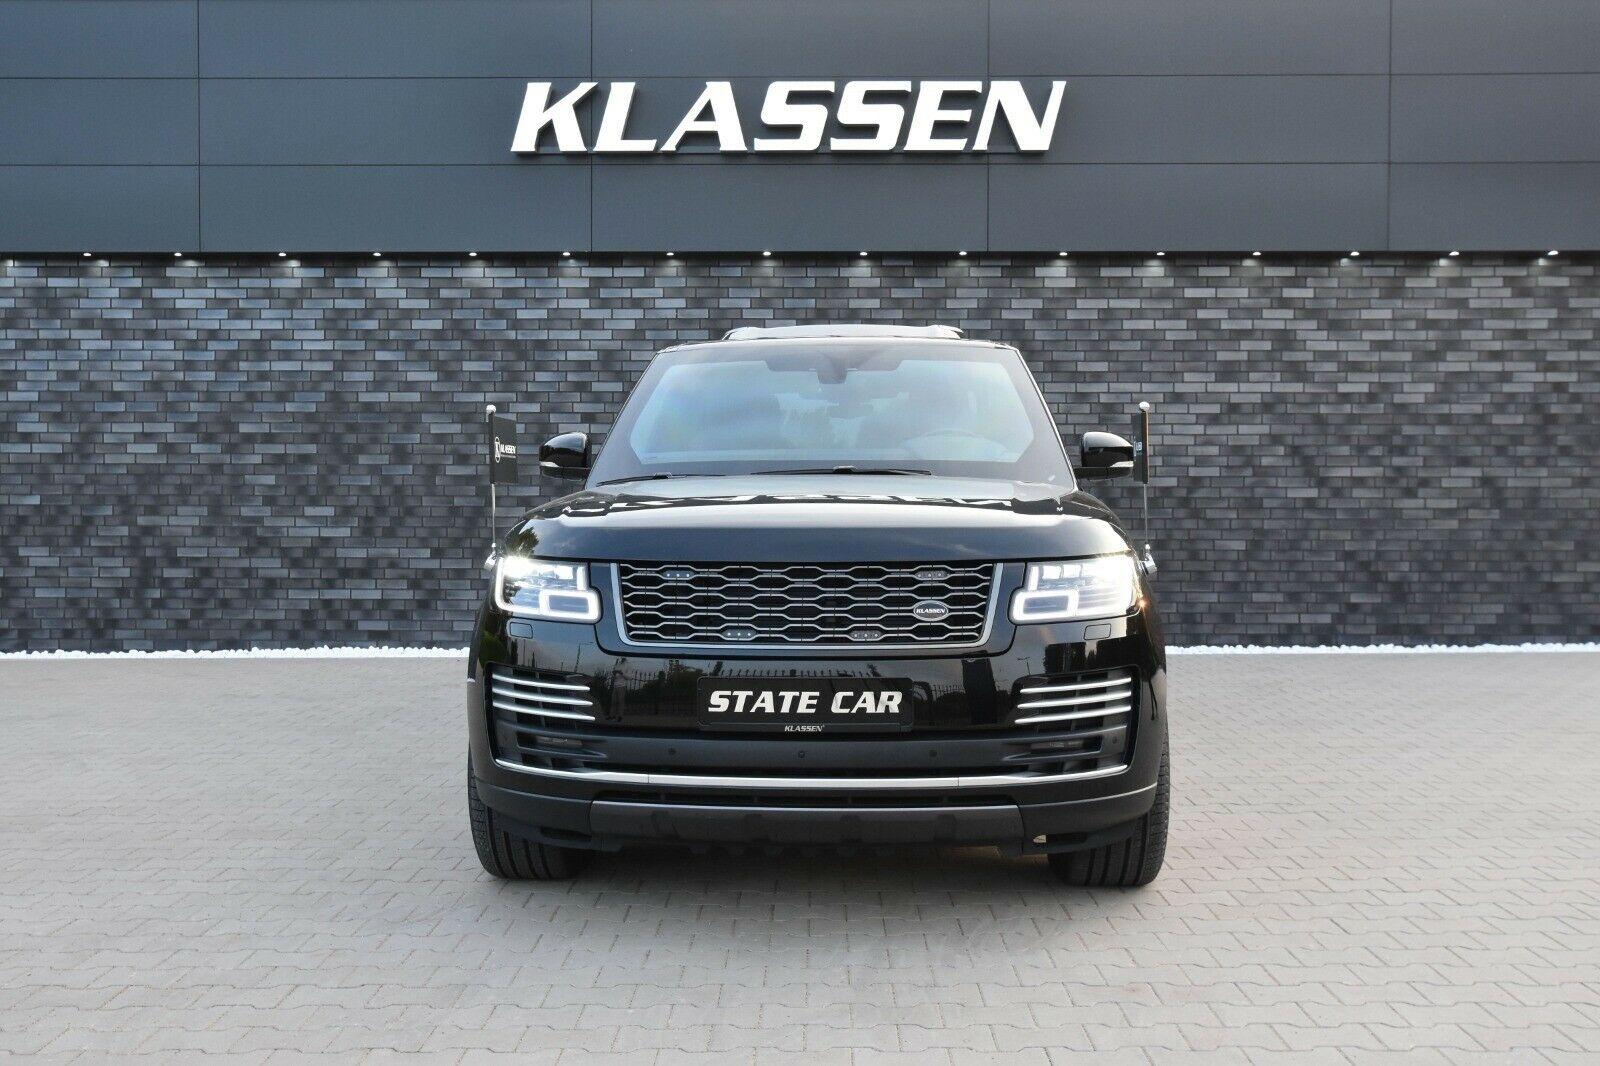 Range-Rover-SVAutobiography-by-Klassen-4